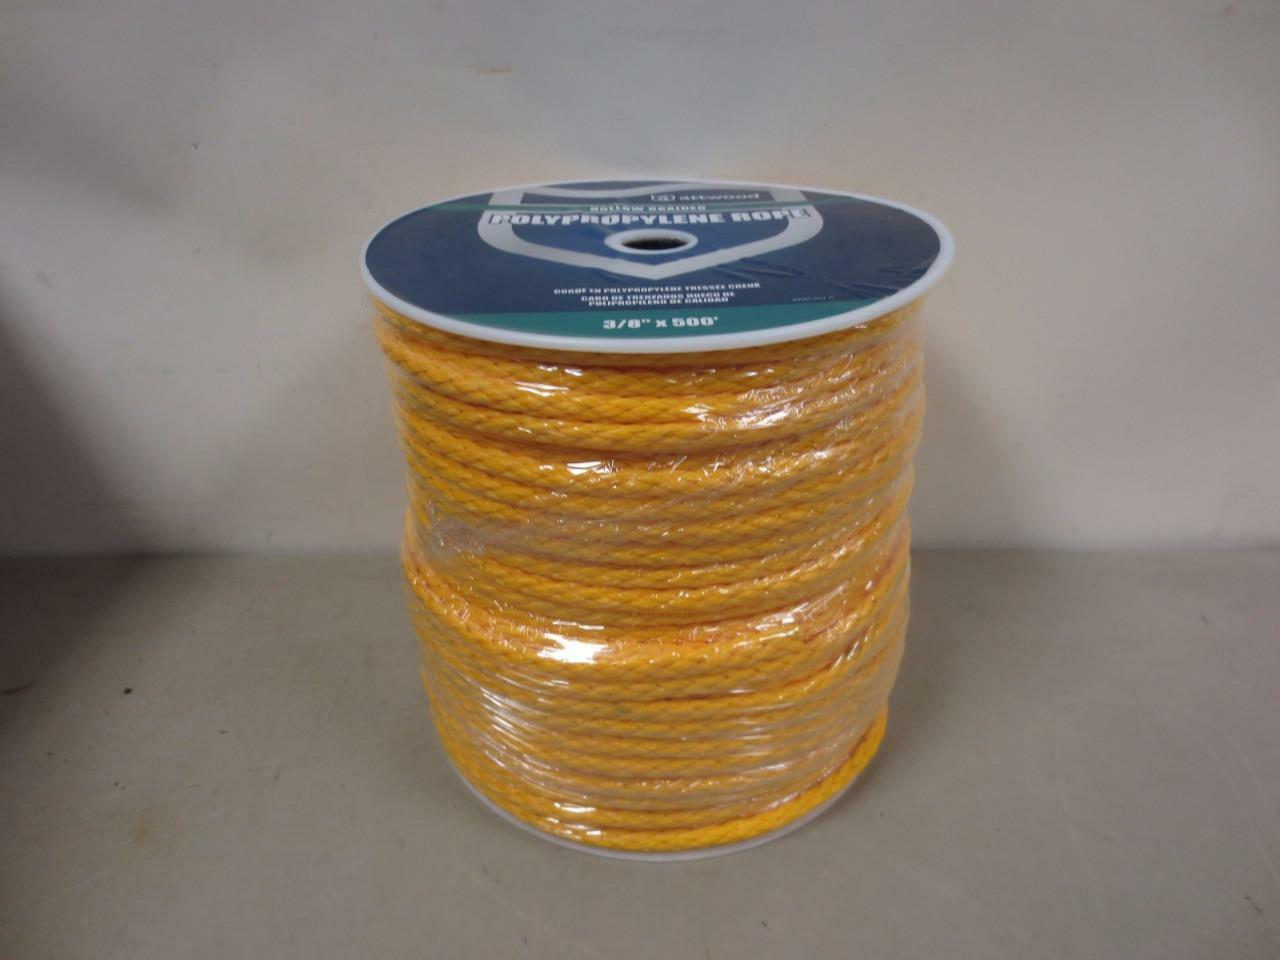 Attwood General Purpose Polypropylene Rope,  Yellow, 500-Feet  good price